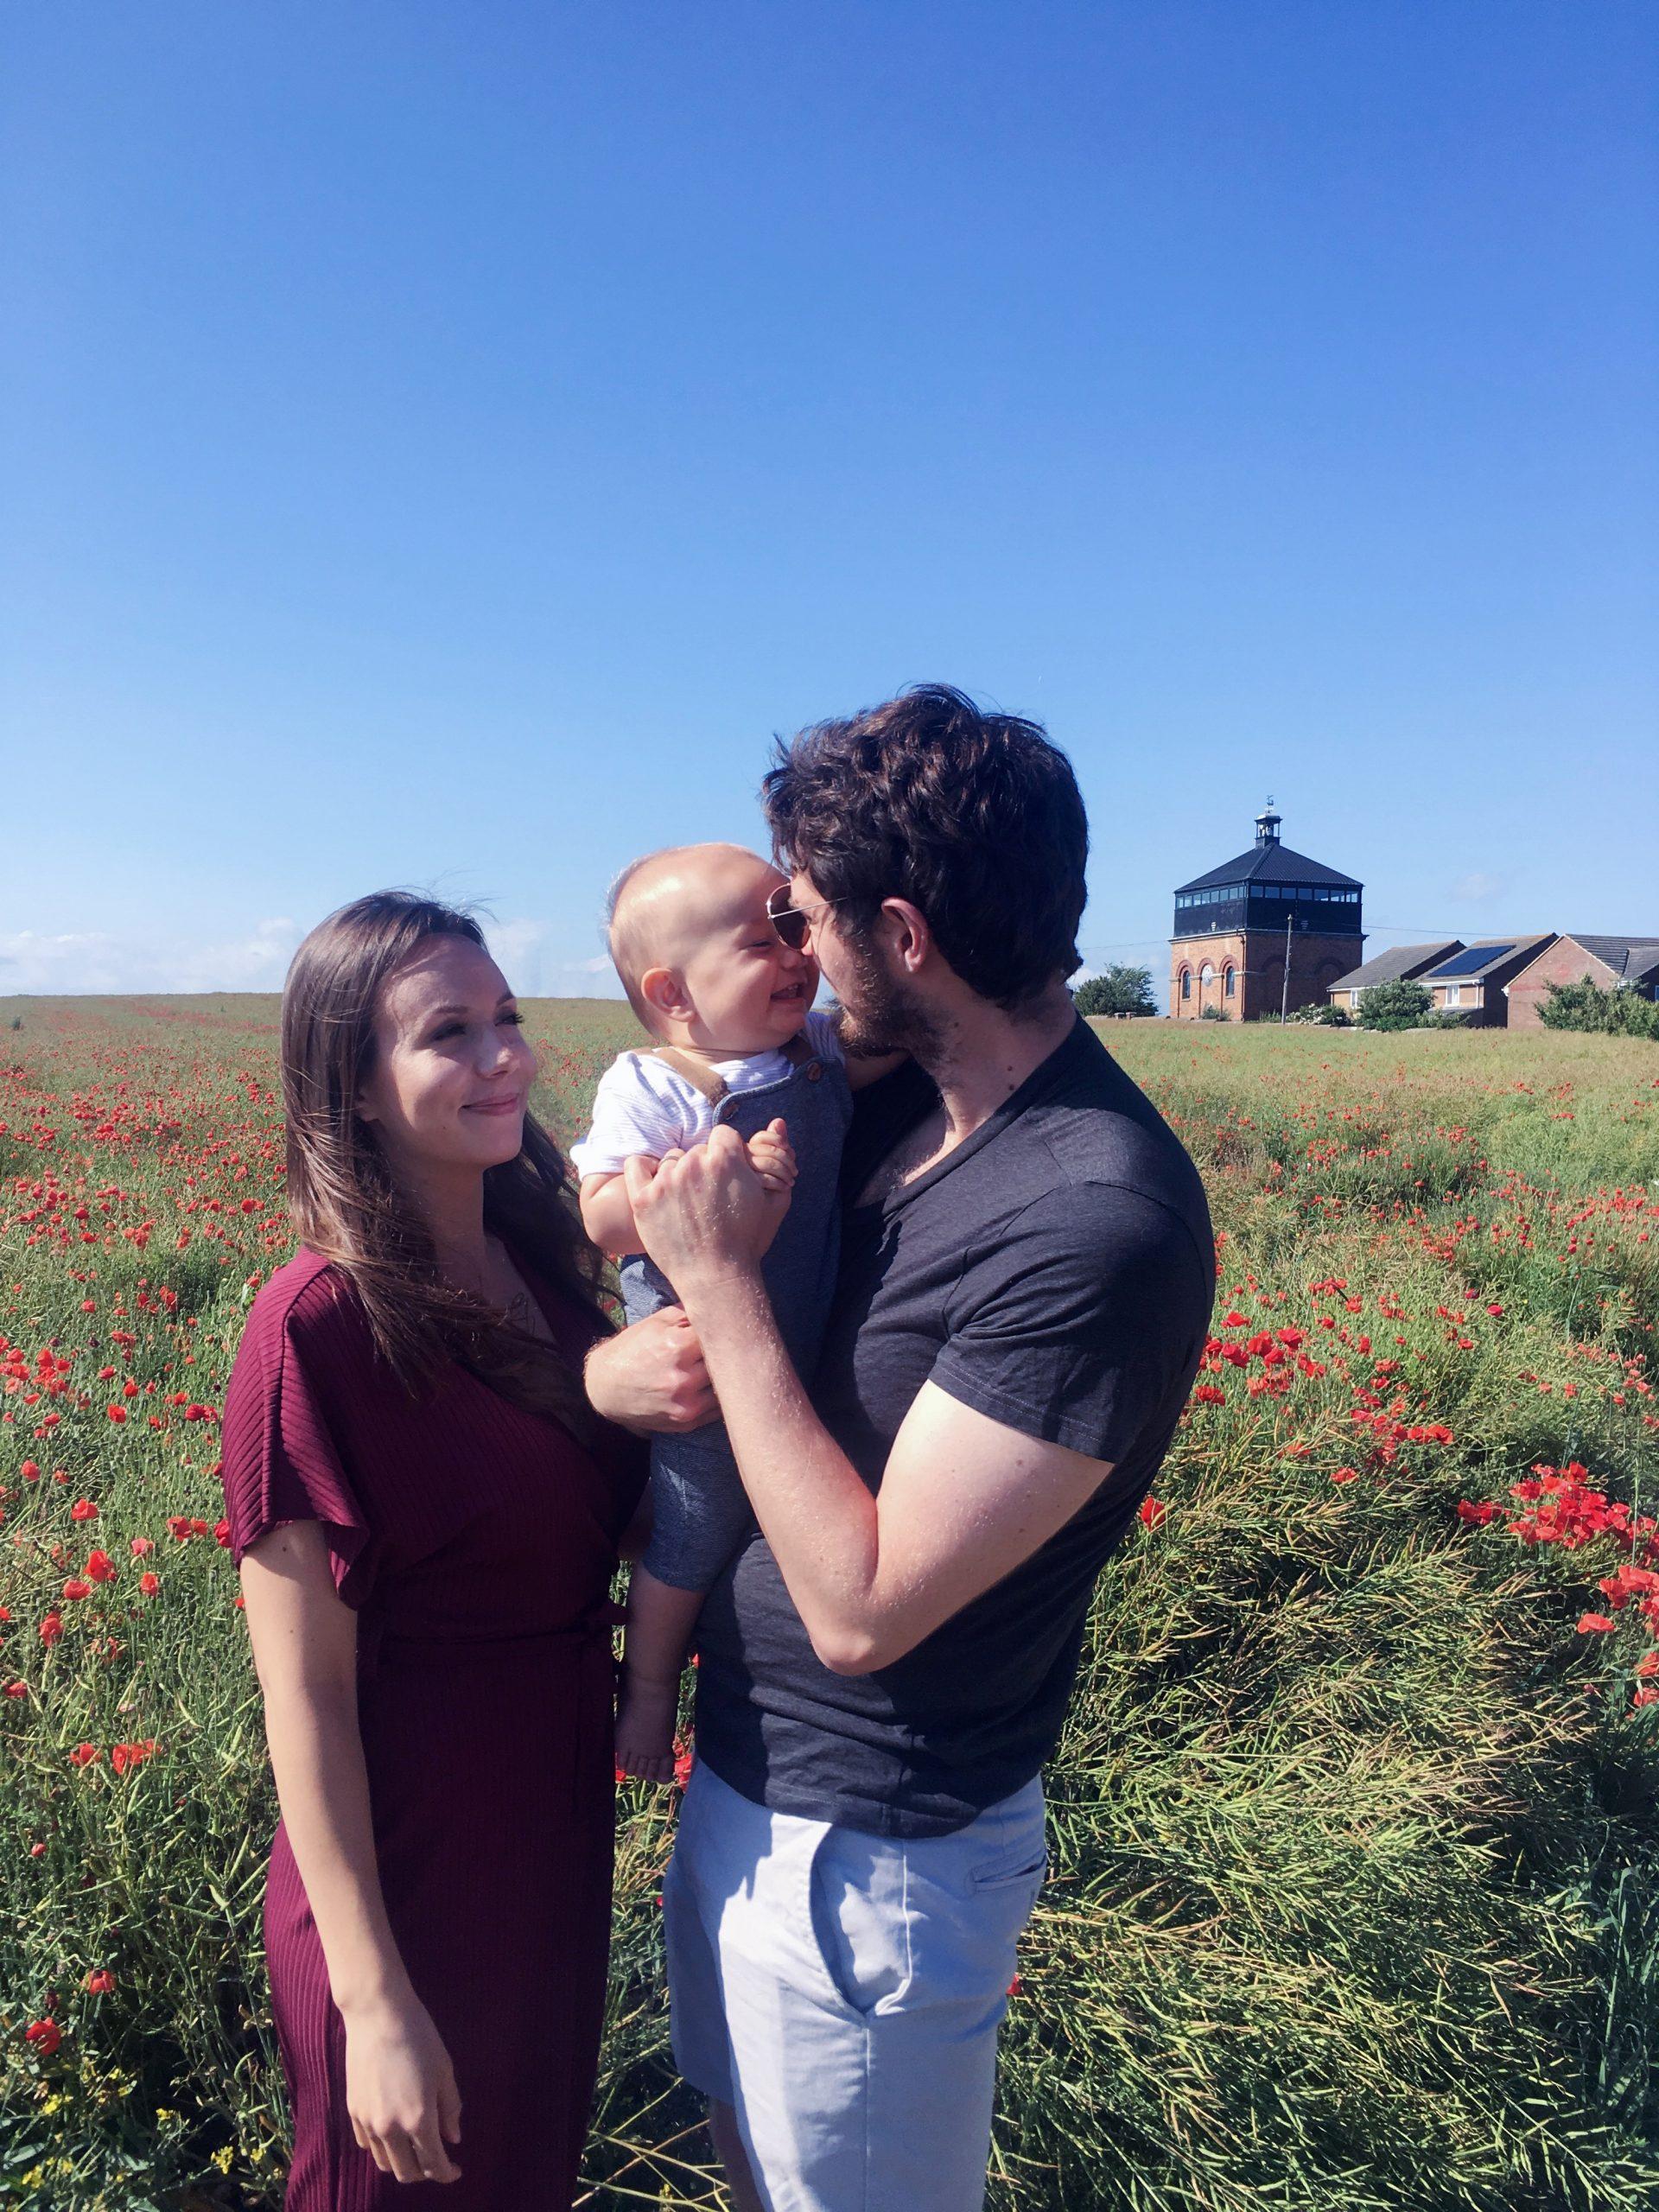 Maria & baby lukas